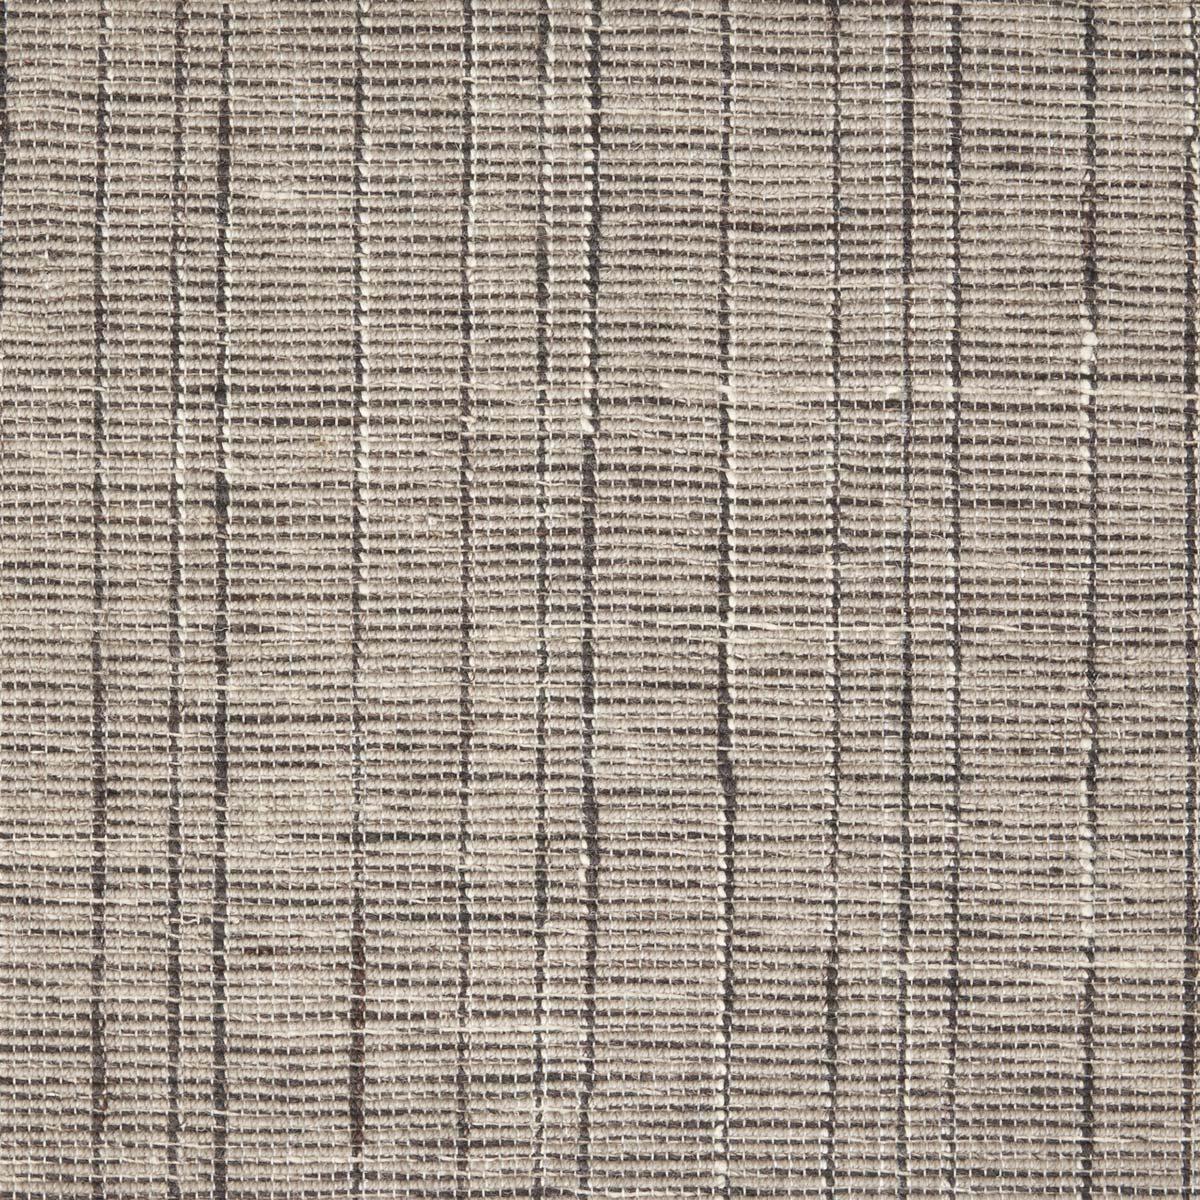 echoed_wool-nylon_broadloom_patterson-flynn-martin_pfm